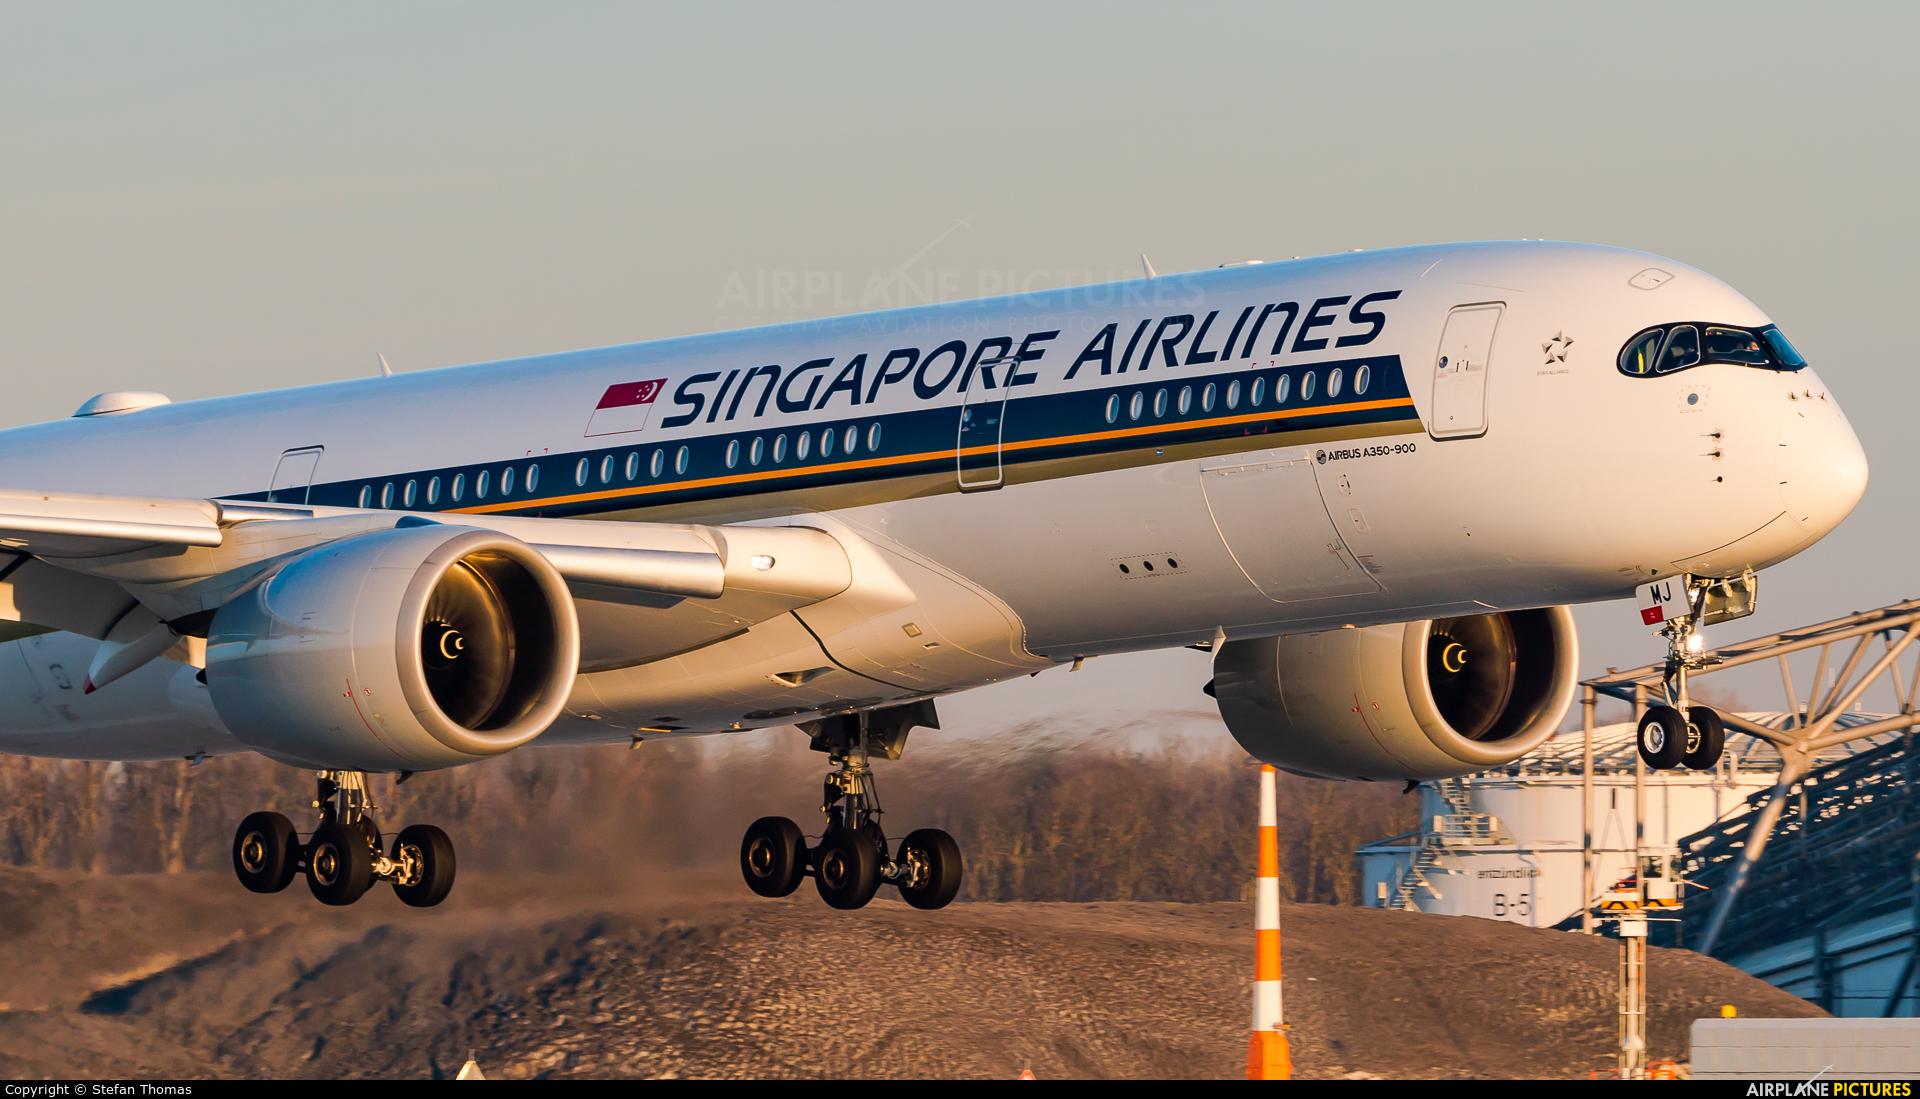 Singapore Airlines 9V-SMJ aircraft at Munich